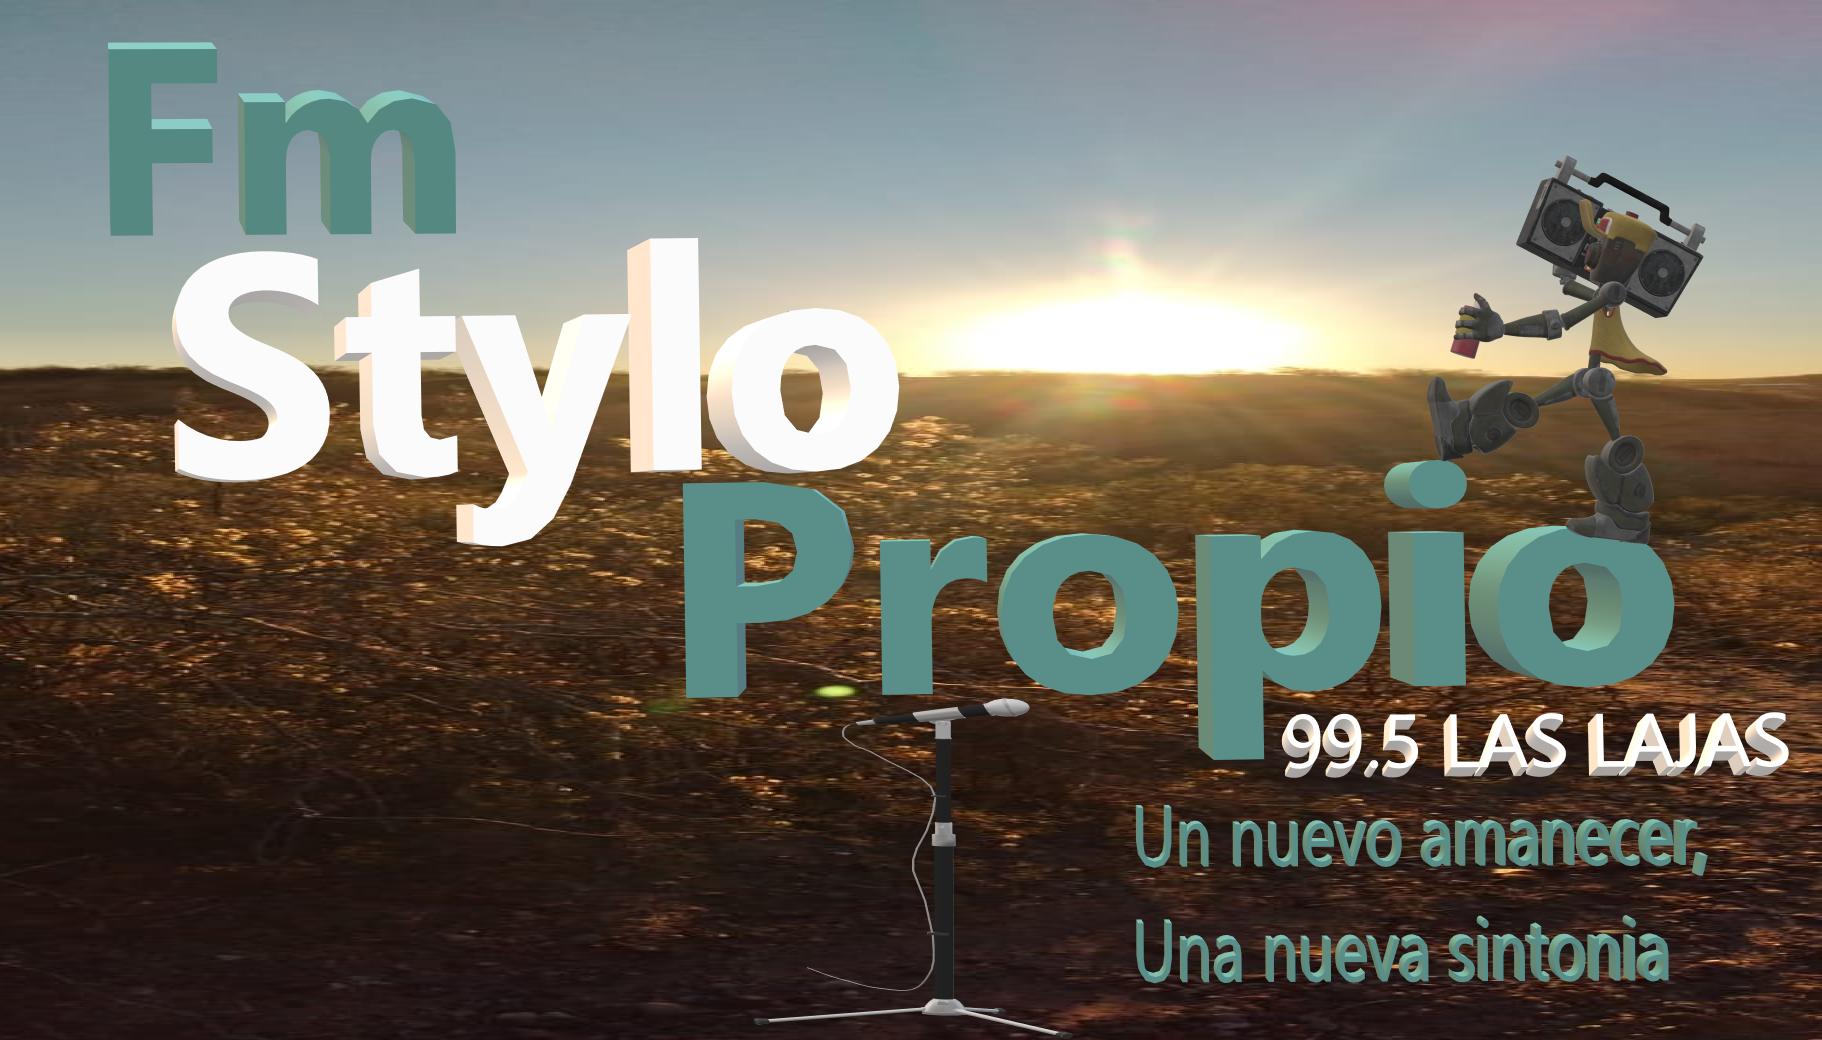 Stylo Propio 99.5